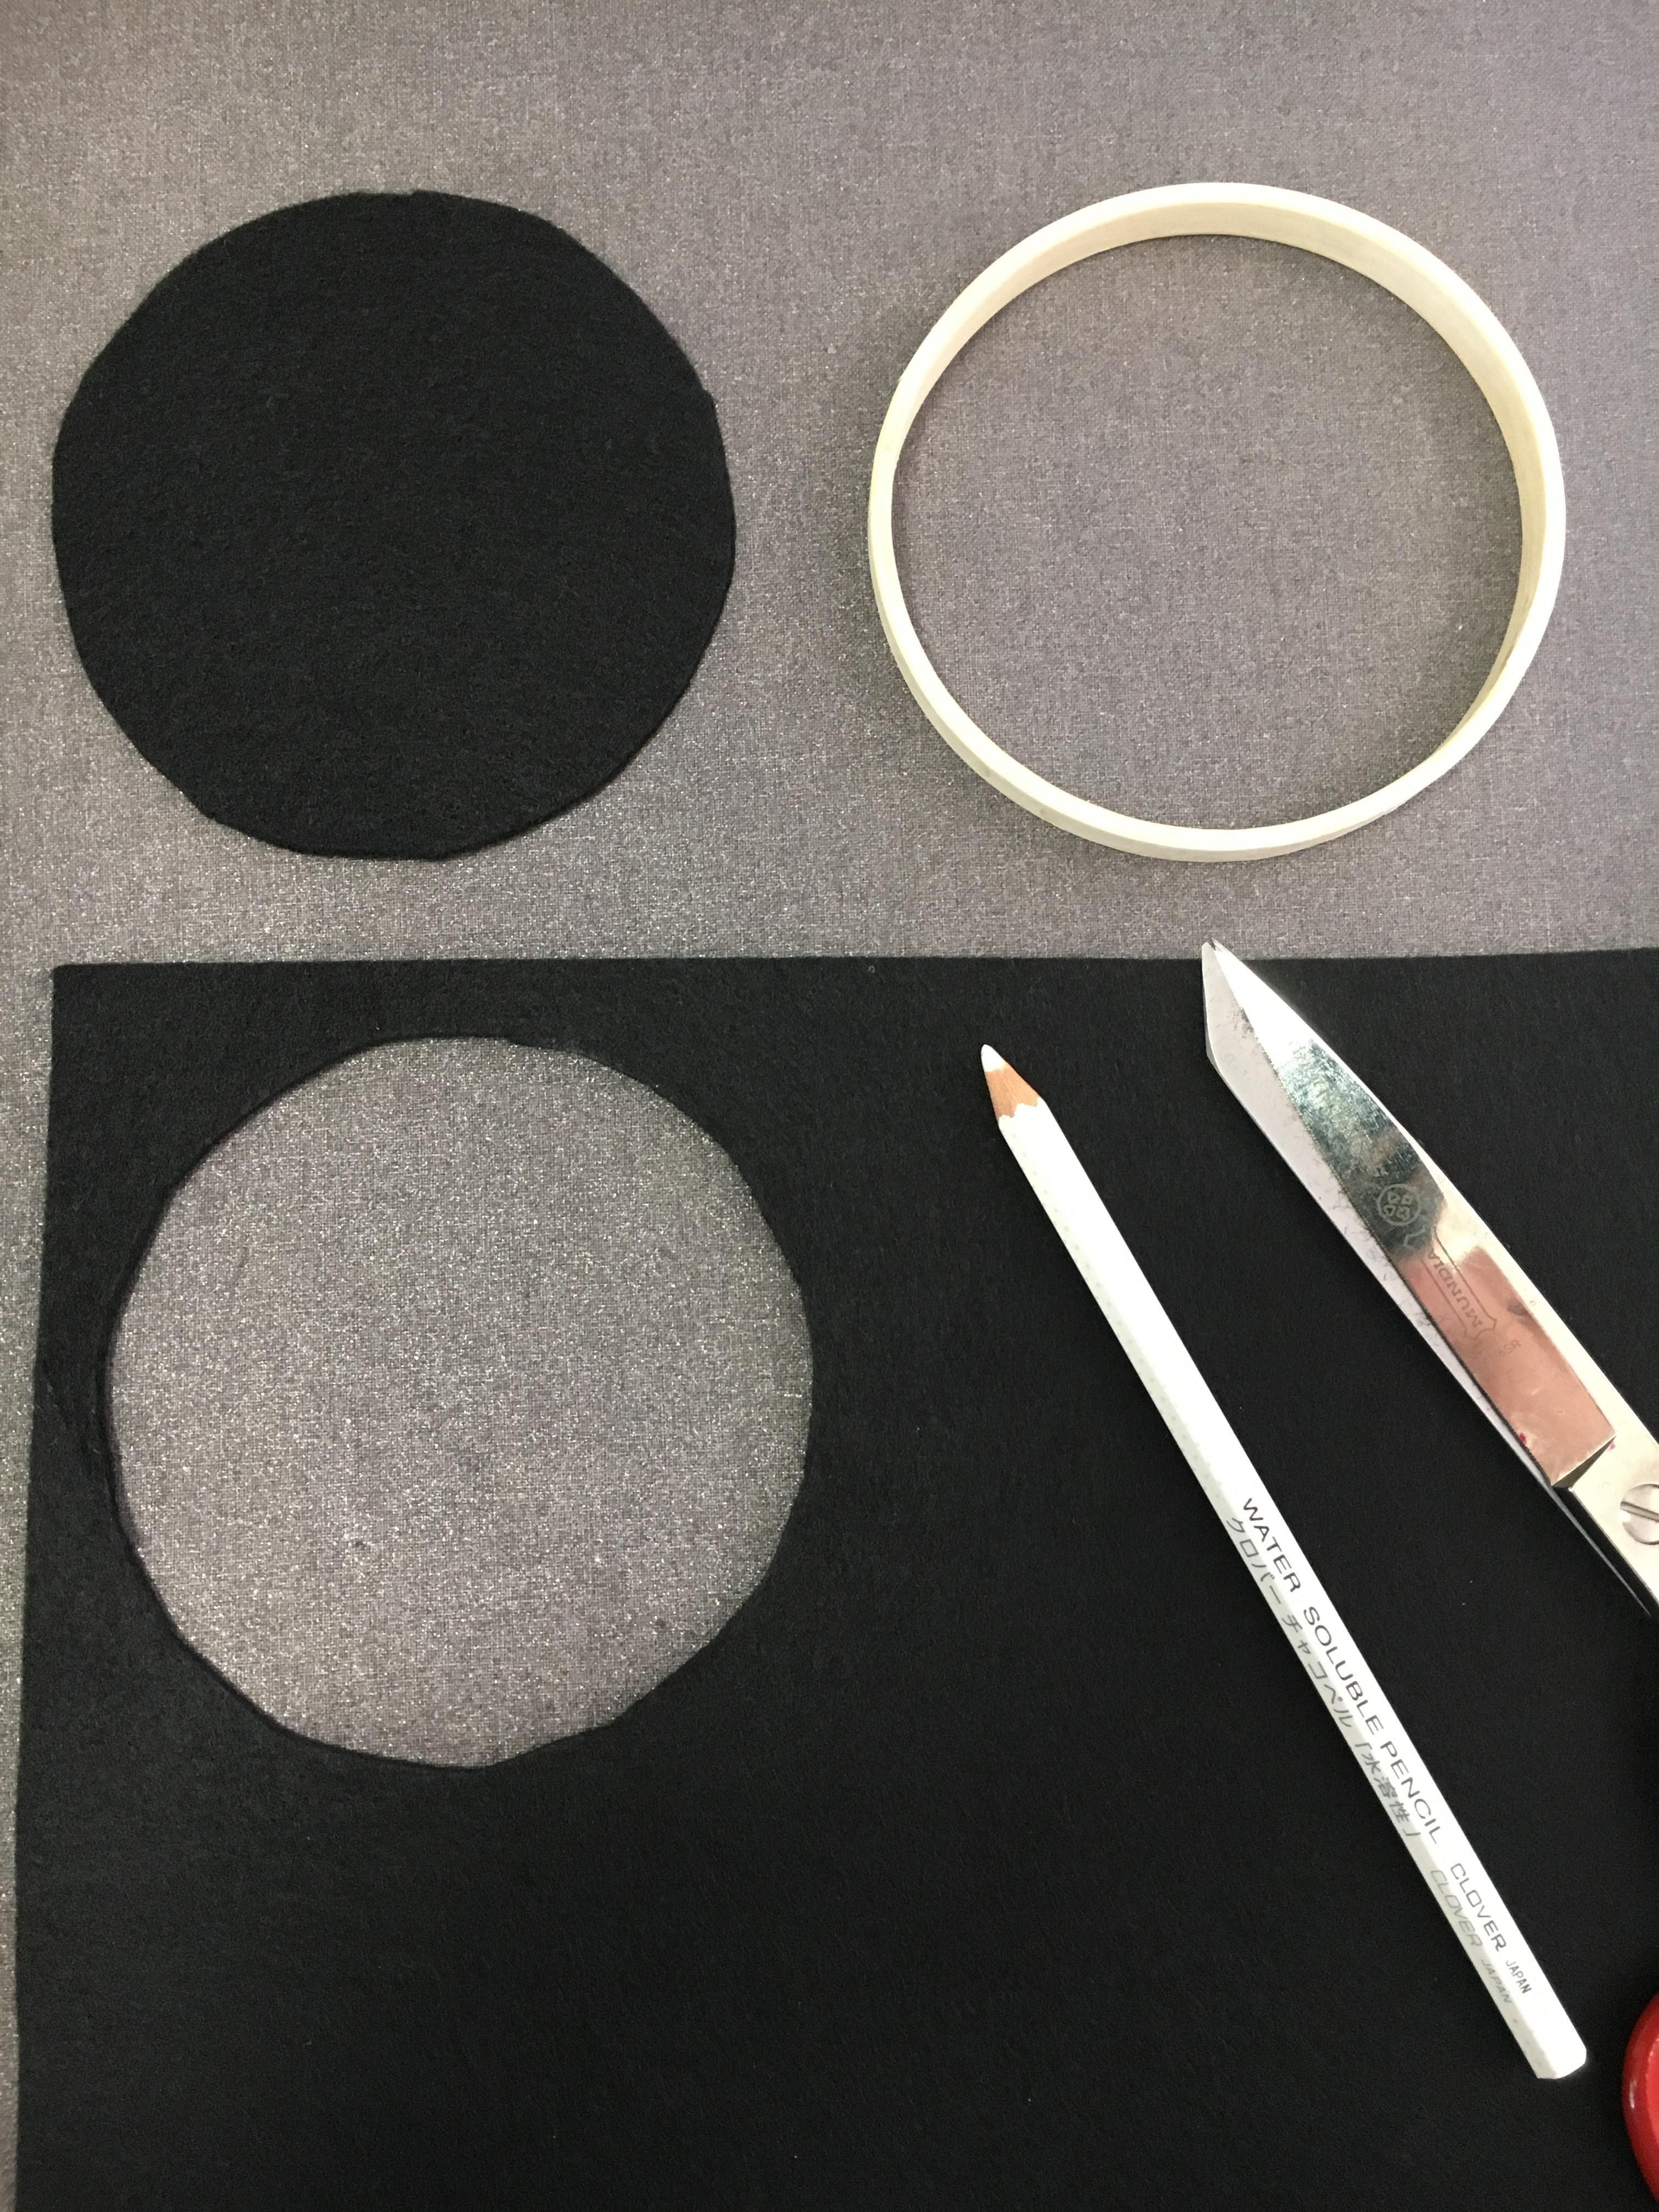 Cross-stitch in progress